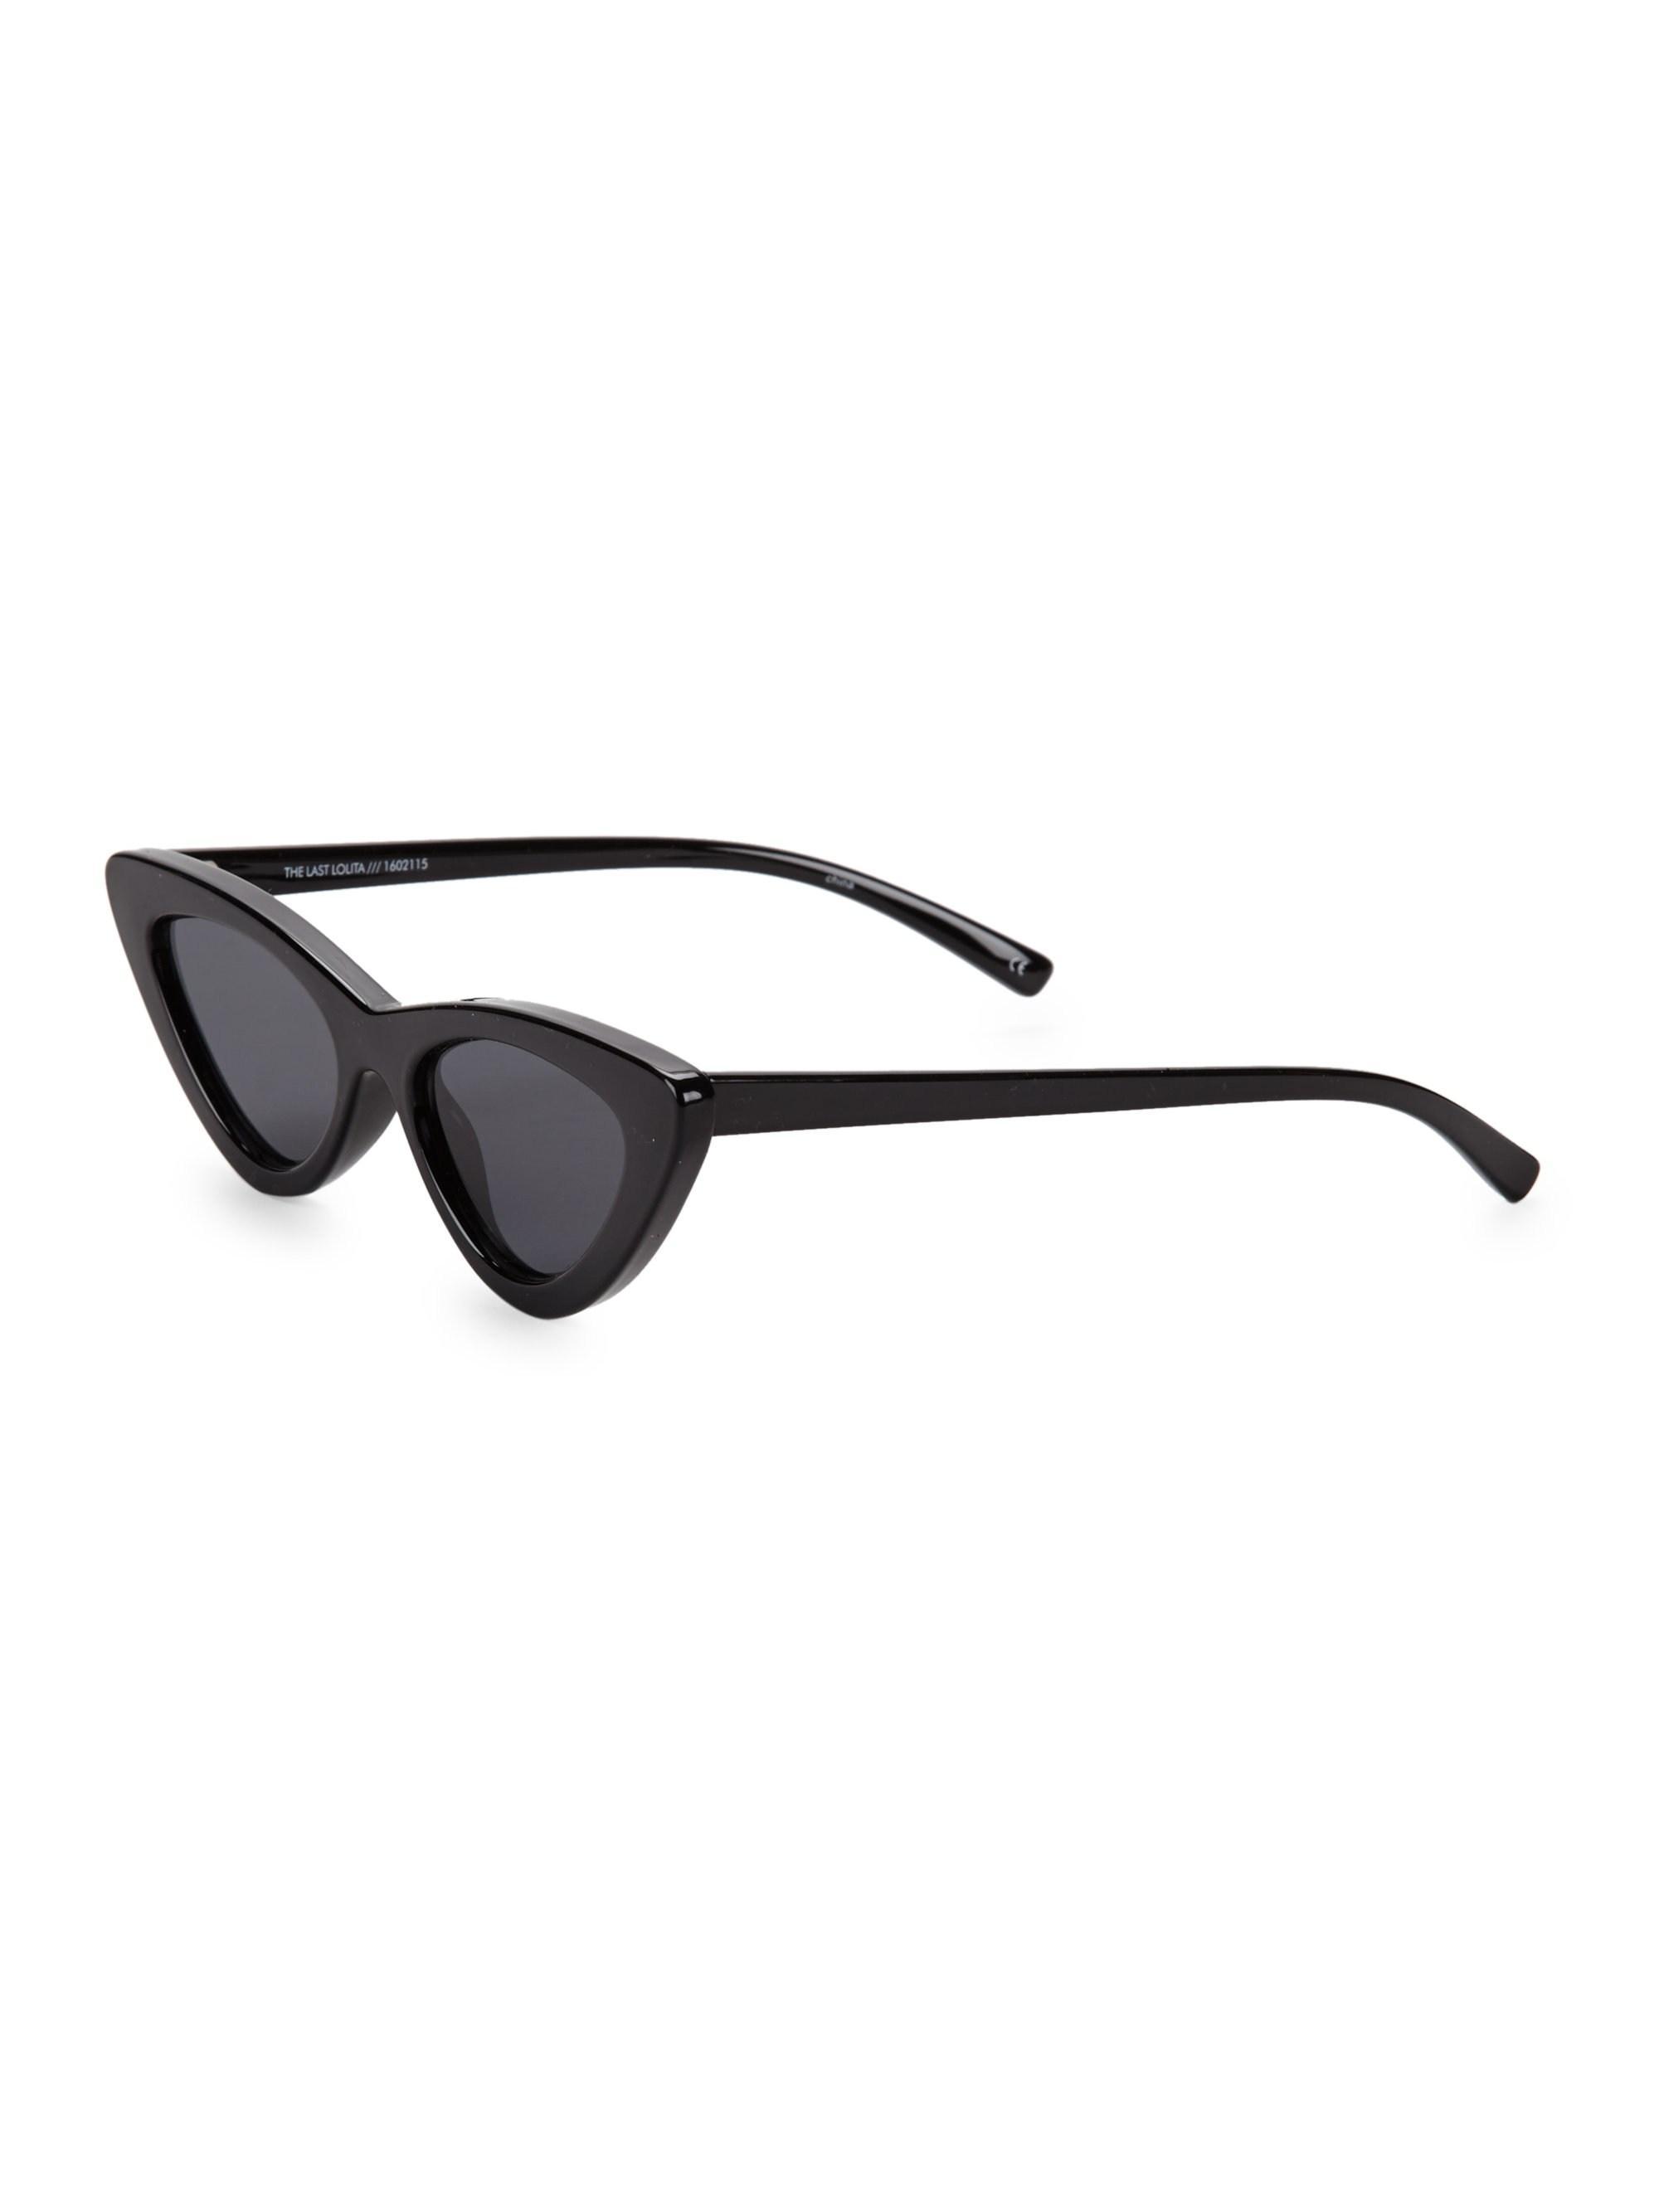 fbb3c7d5999 Le Specs - The Last Lolita Black Sunglasses - Lyst. View fullscreen